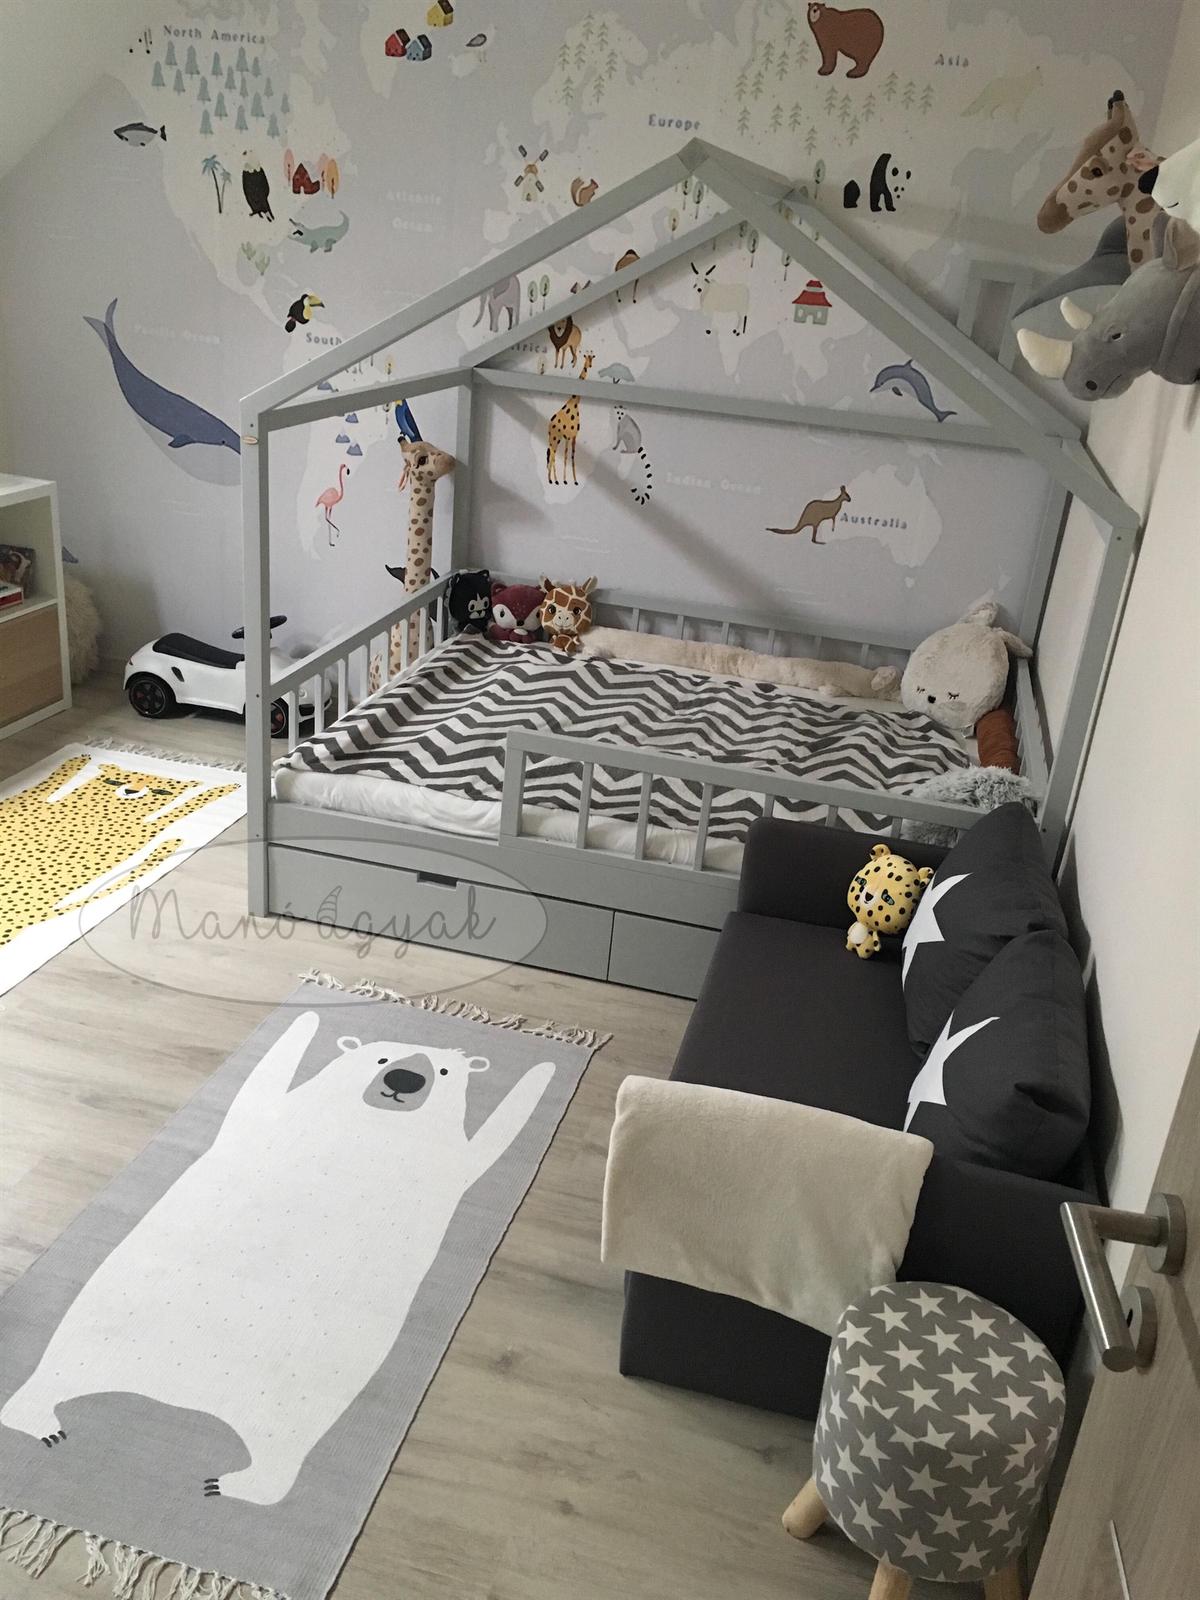 Pin By Gabriella Kordik On Gyerekszoba In 2020 Kids Room Paint